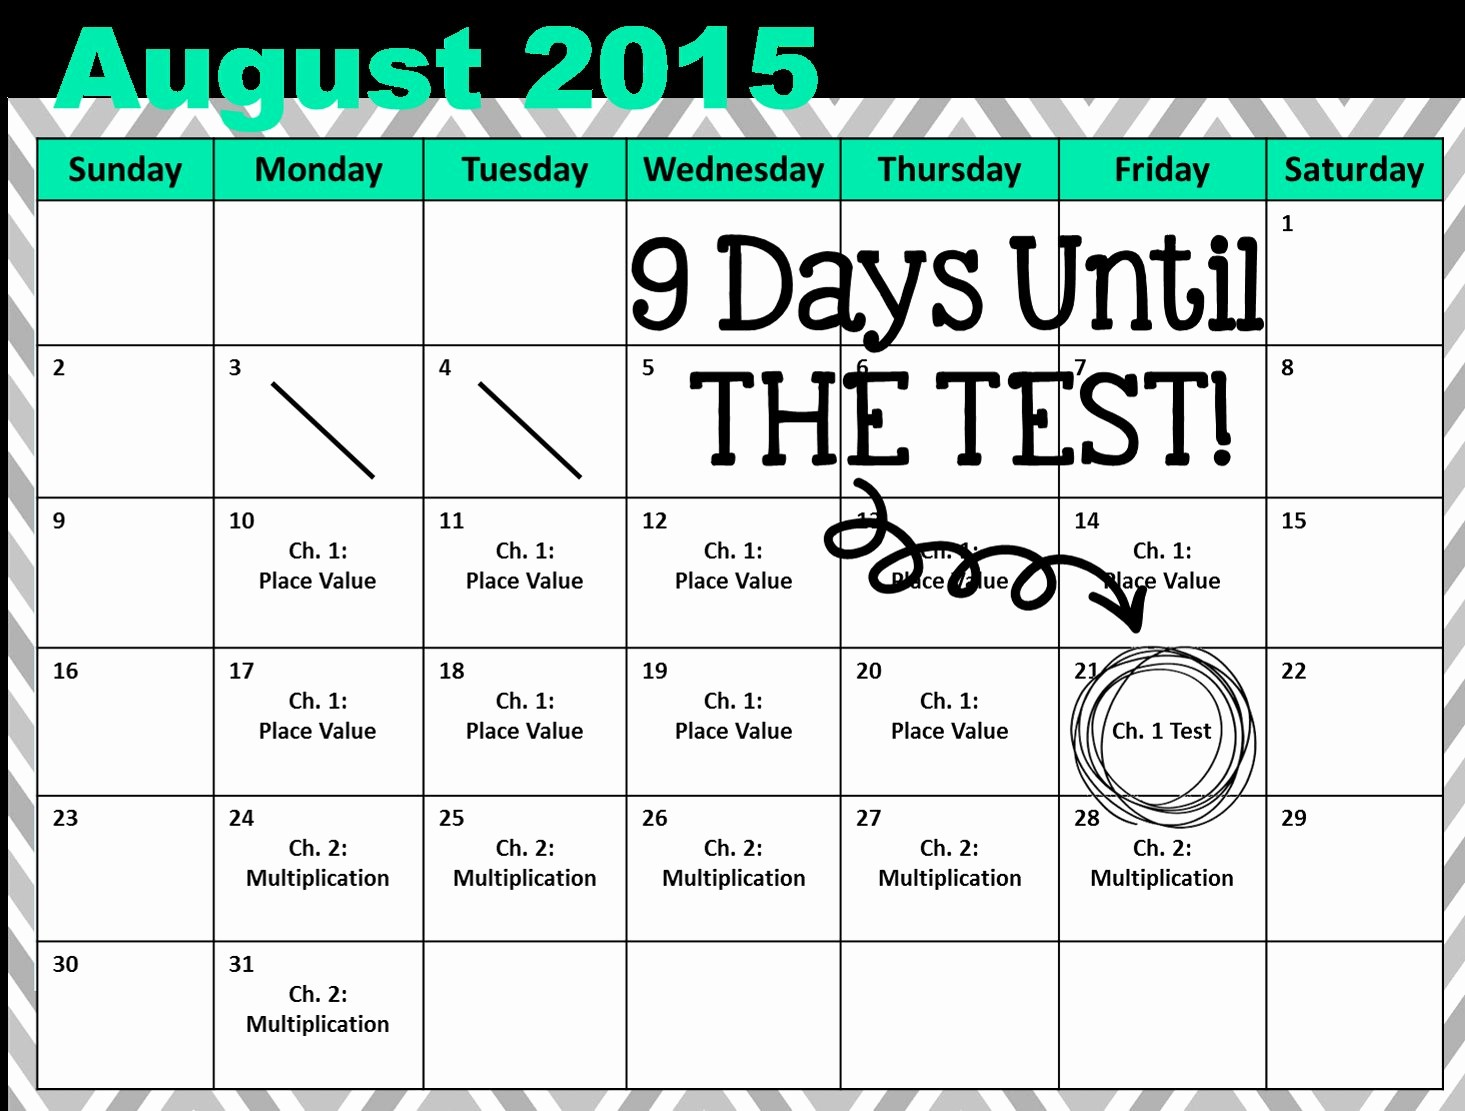 Pacing Calendar Template for Teachers Elegant Pacing Calendar Template for Teachers Best Downloadable